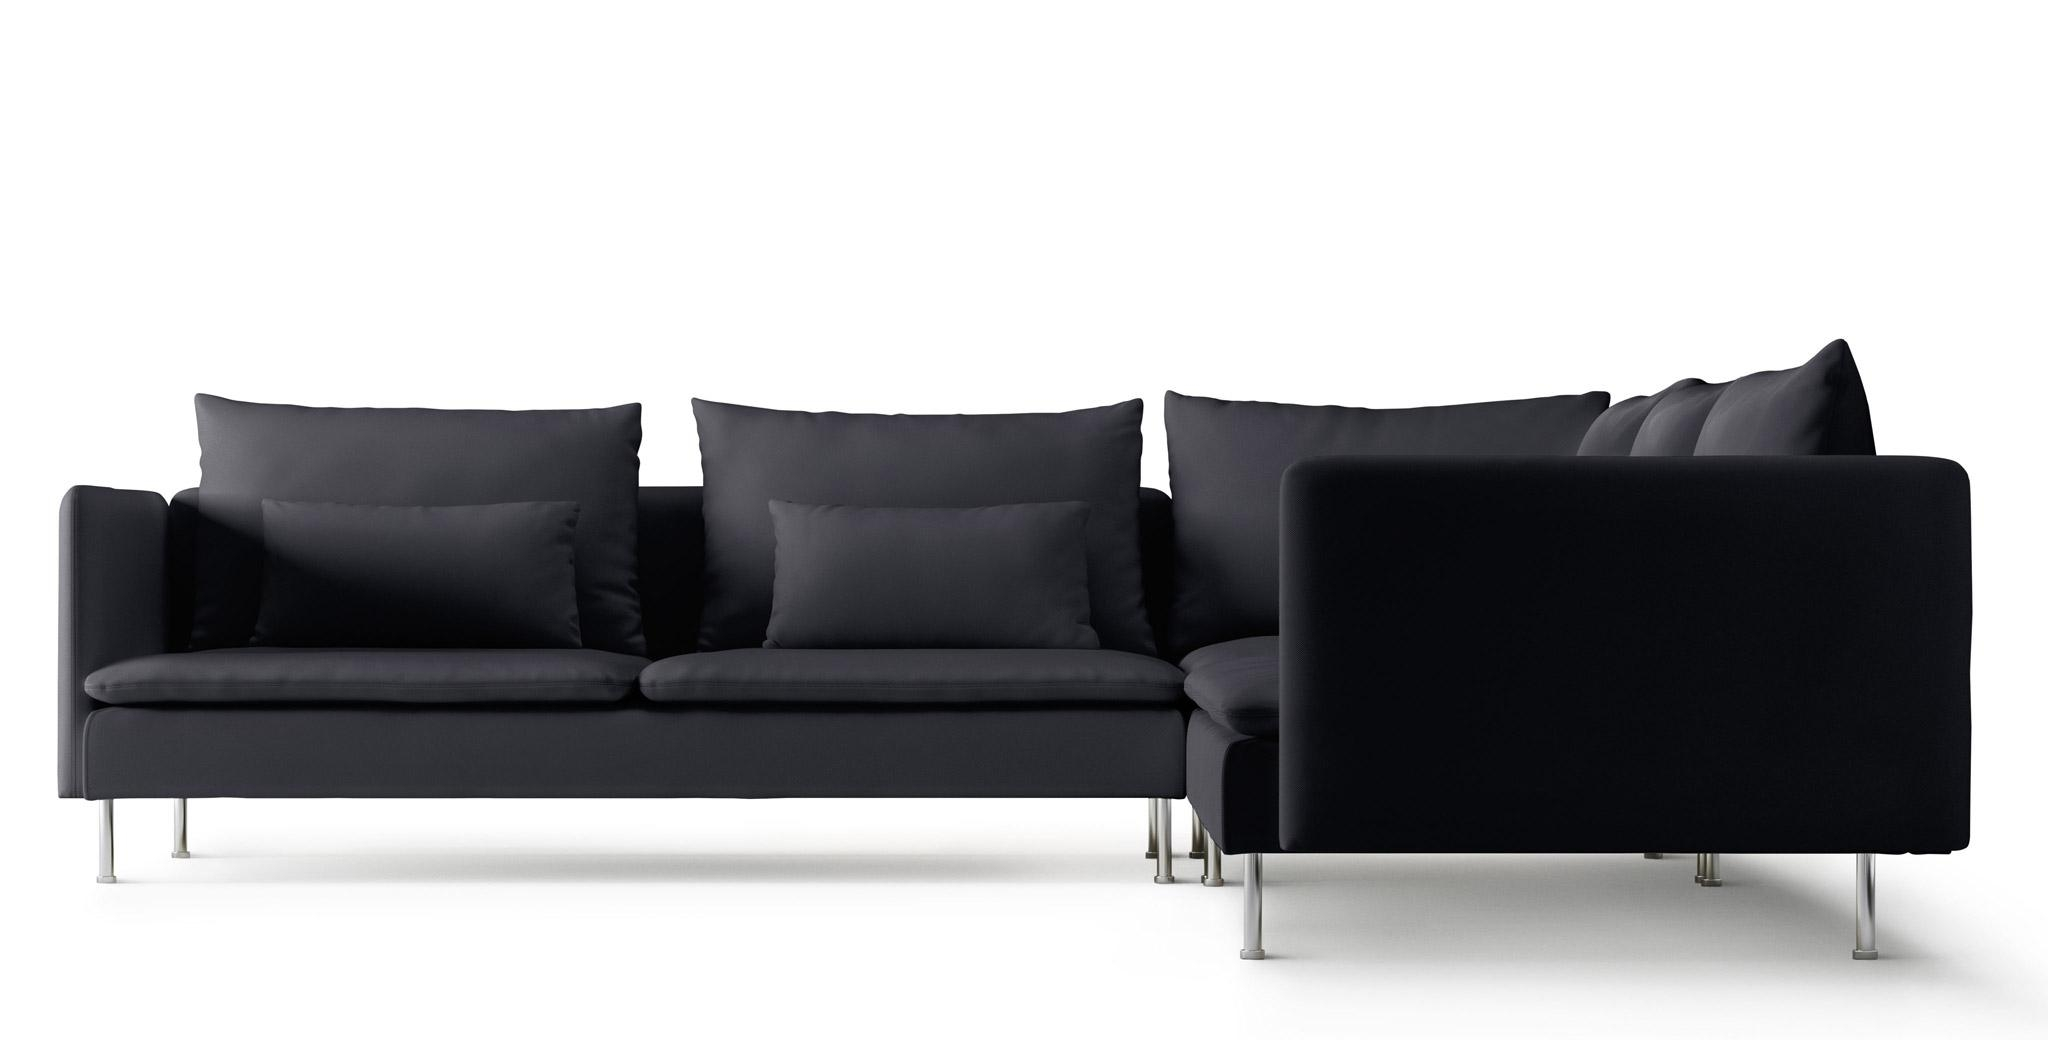 Fabric Corner Sofas | Ikea Intended For Black Corner Sofas (View 19 of 20)